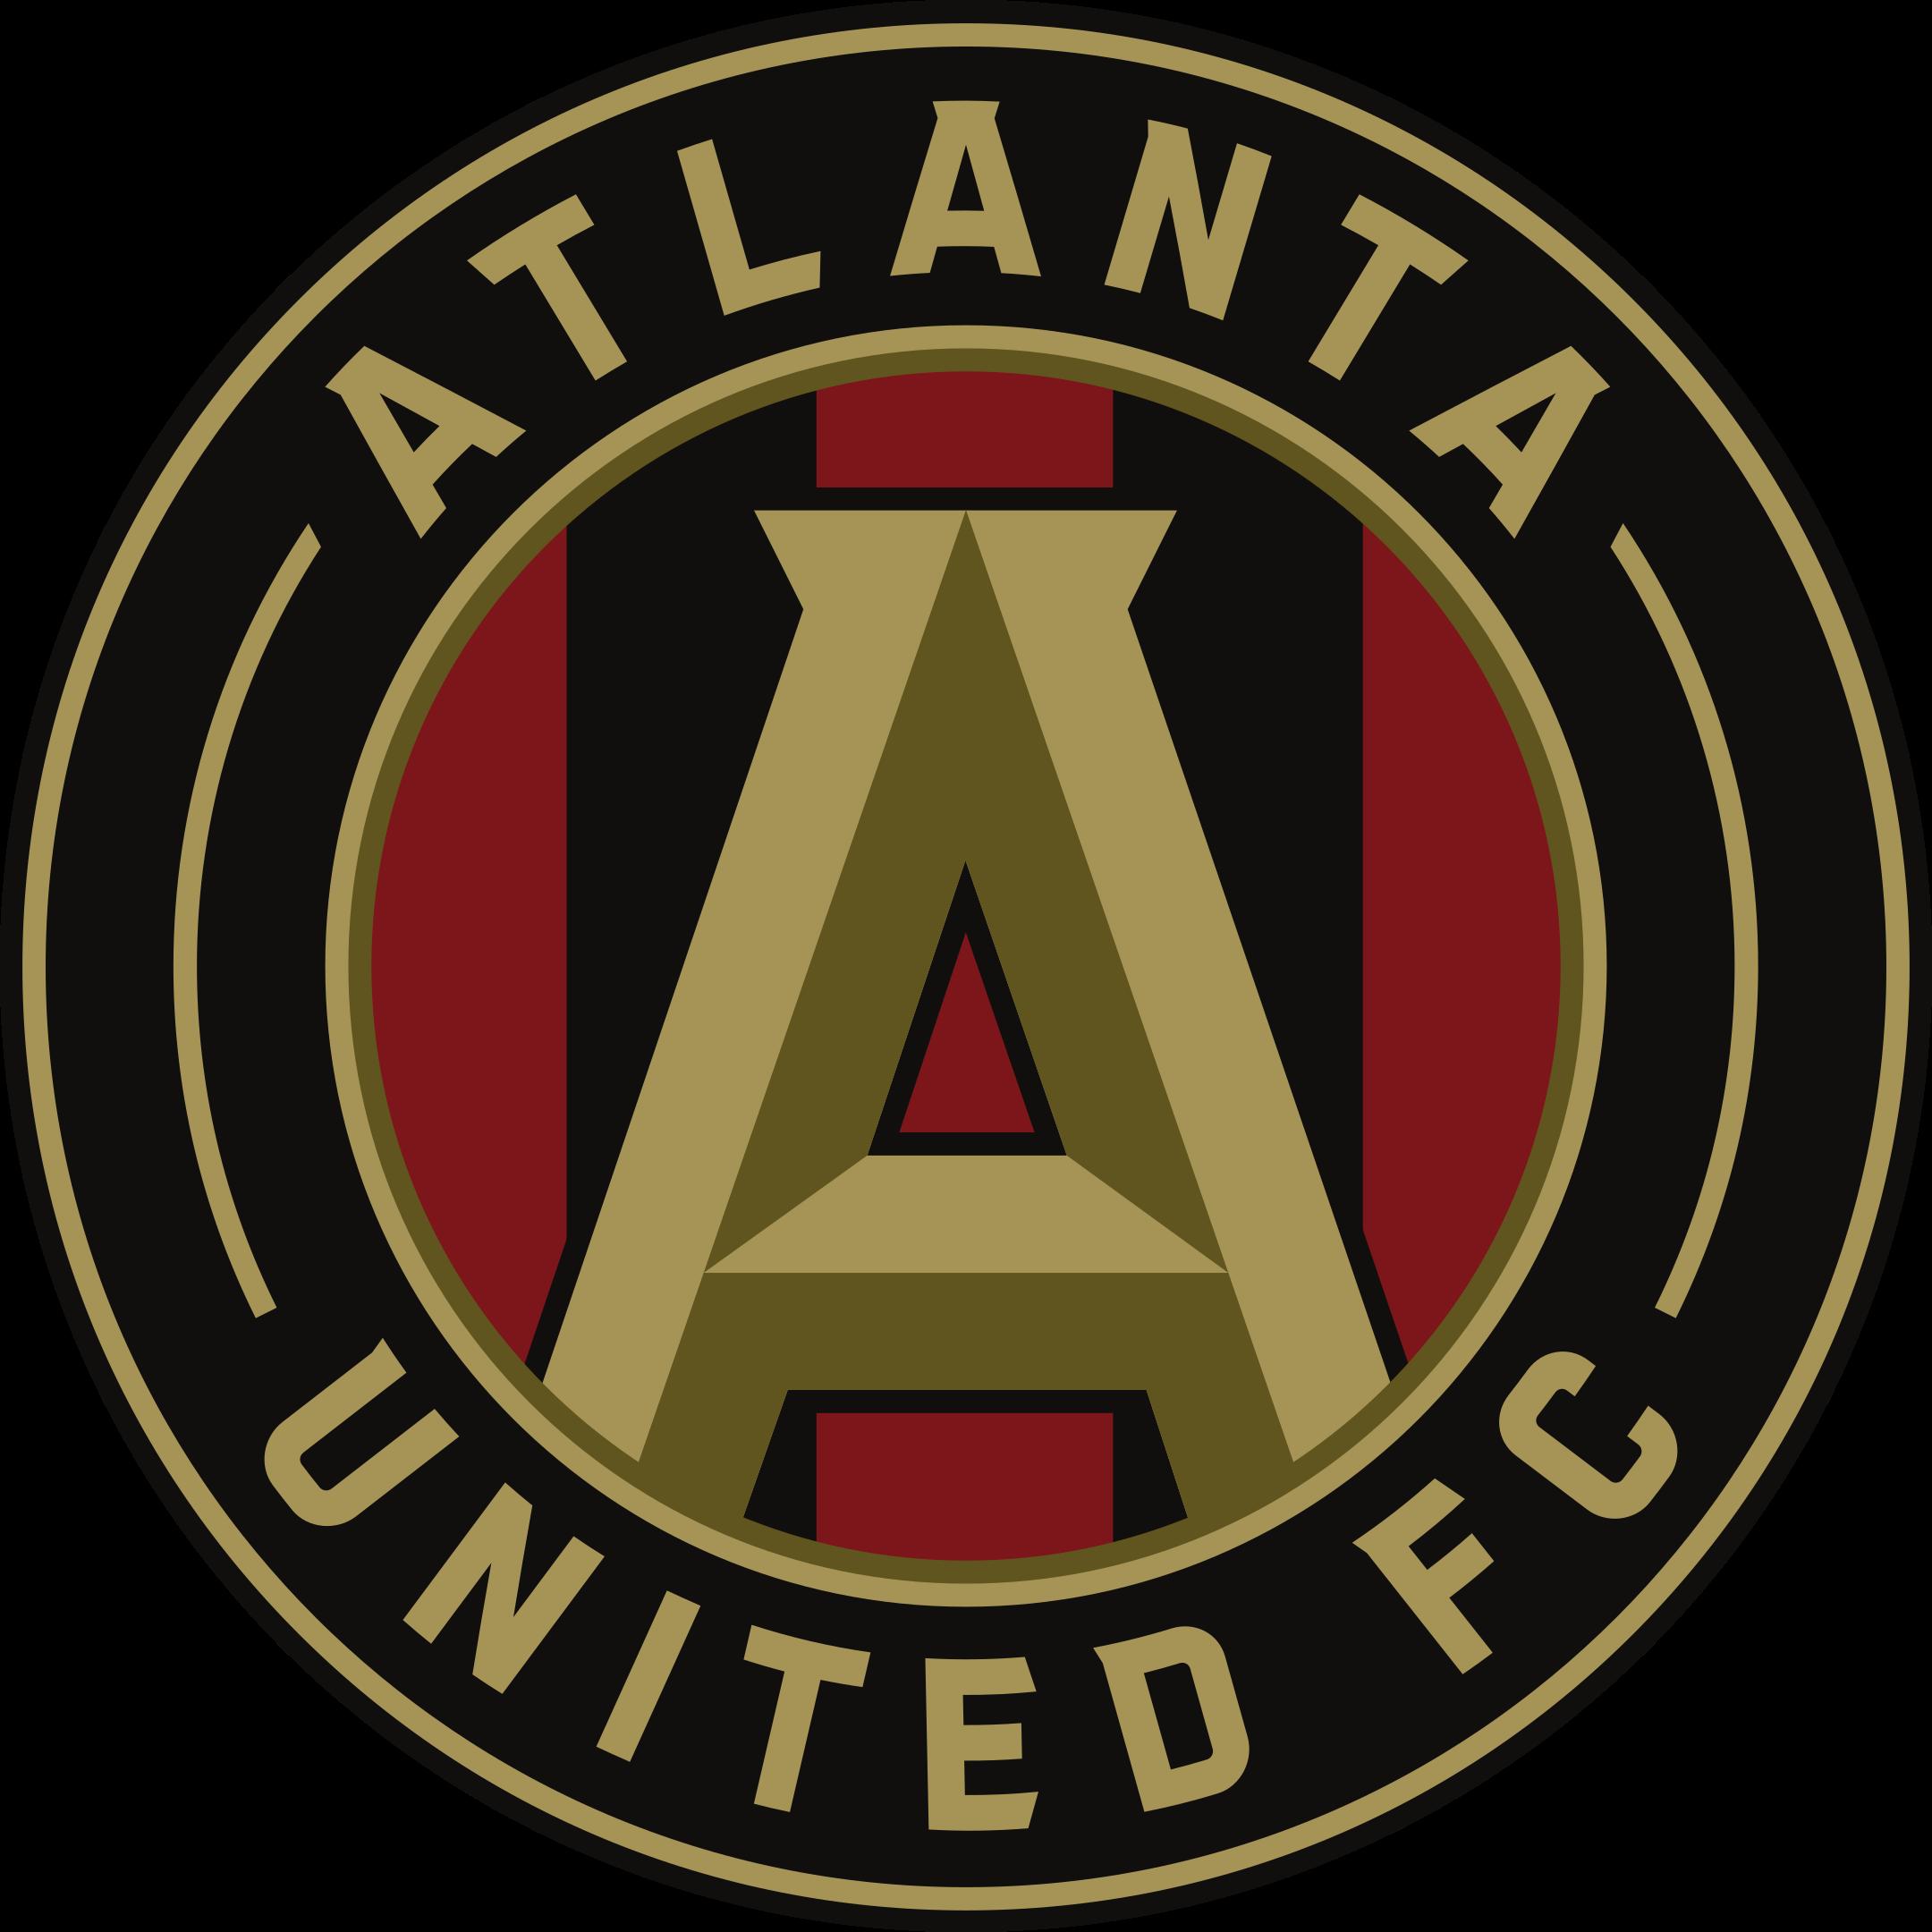 atlanta united fc logo 1 - Atlanta United FC Logo